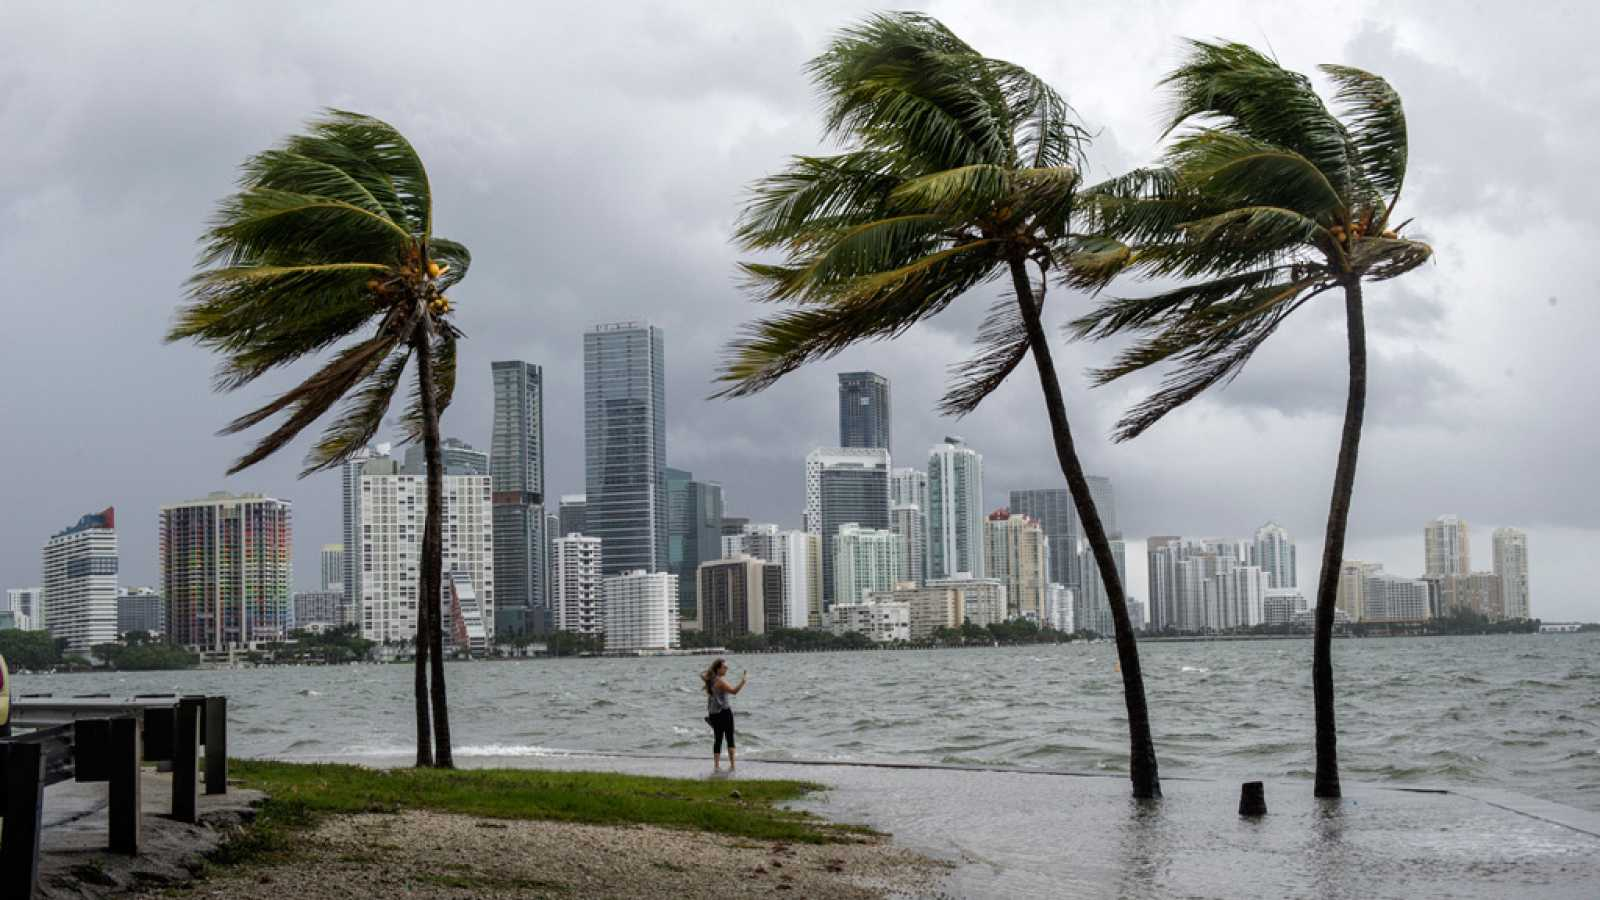 Resultado de imagen para miami huracan